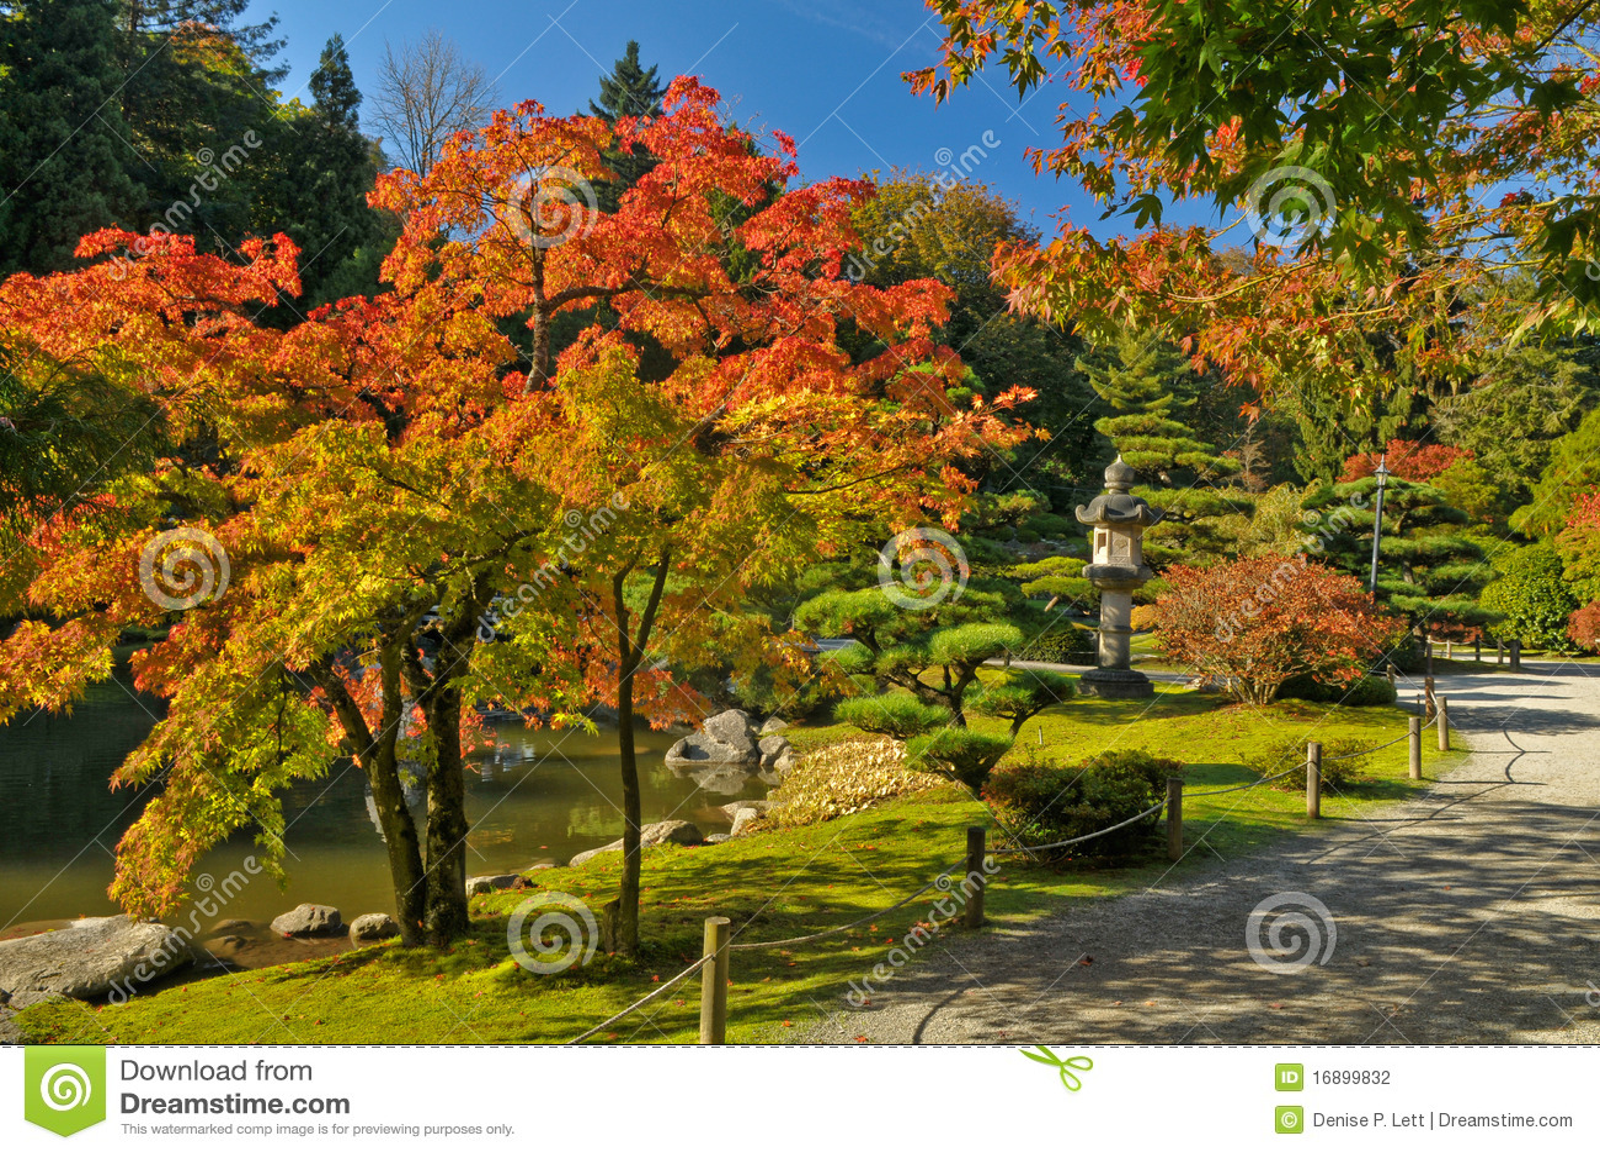 Fall Foliage Along Japanese Garden Path Stock Photo - Image of fall ...